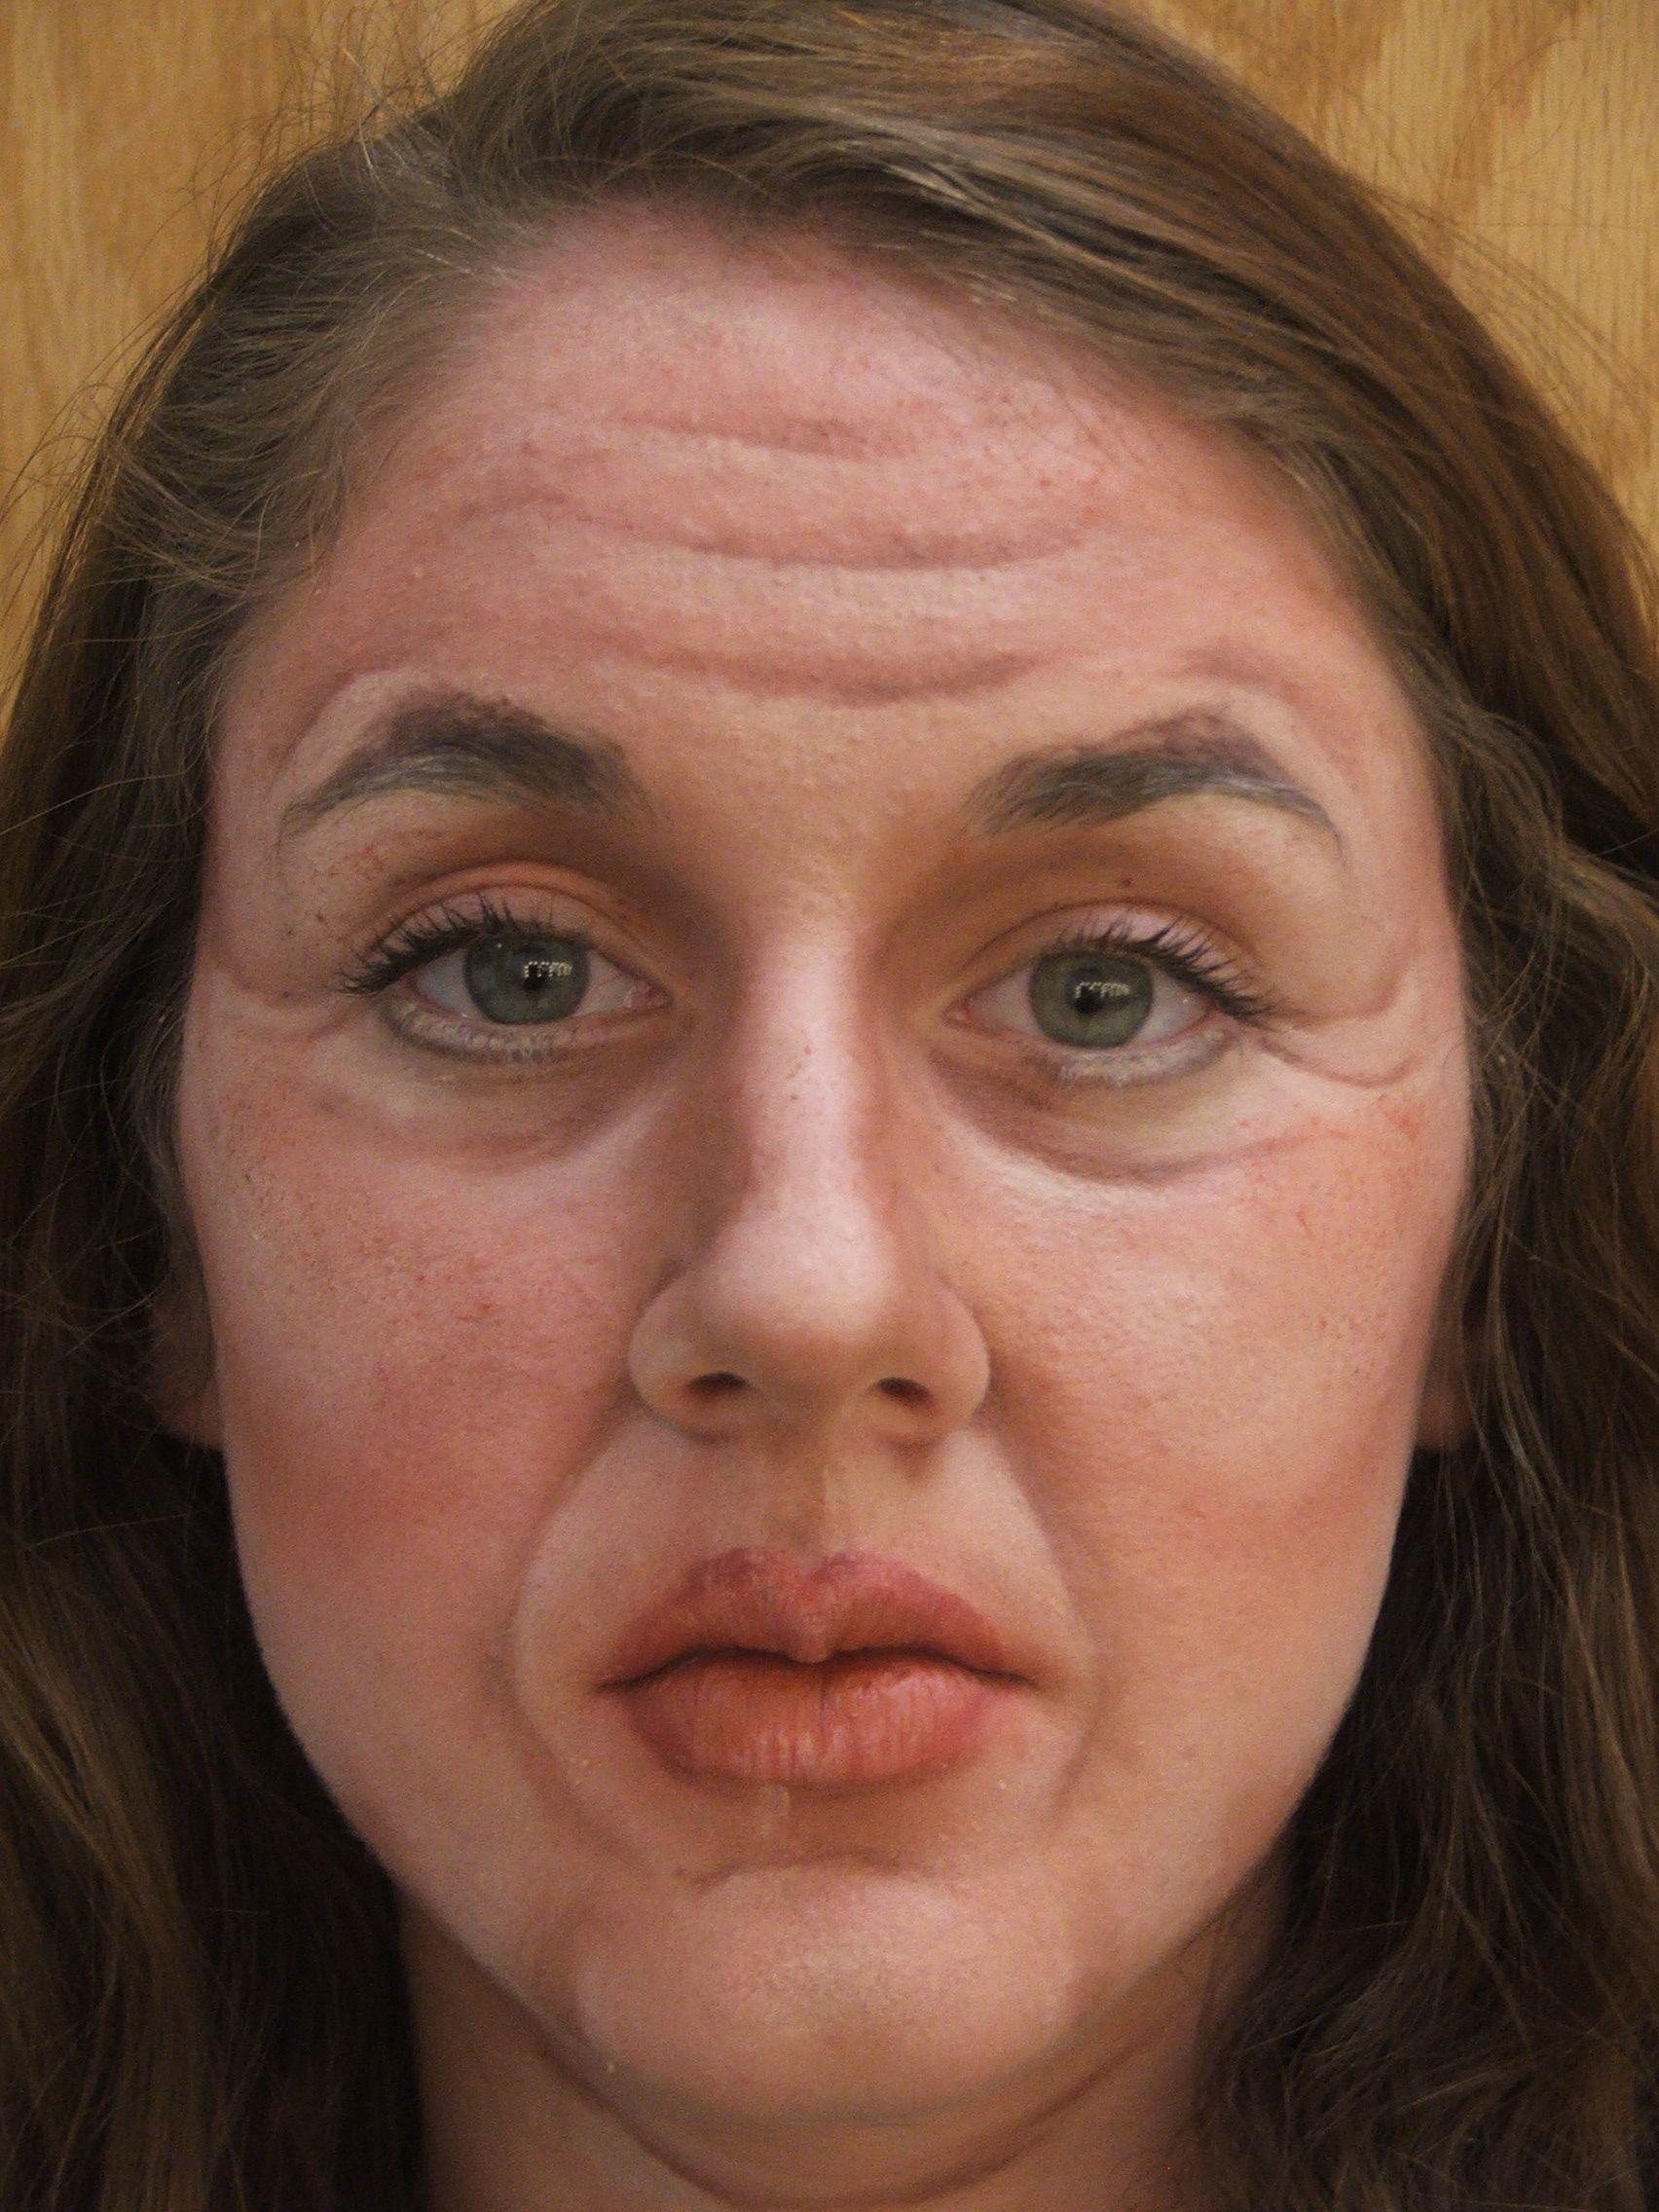 Old Age | Makeup Morgue | Pinterest